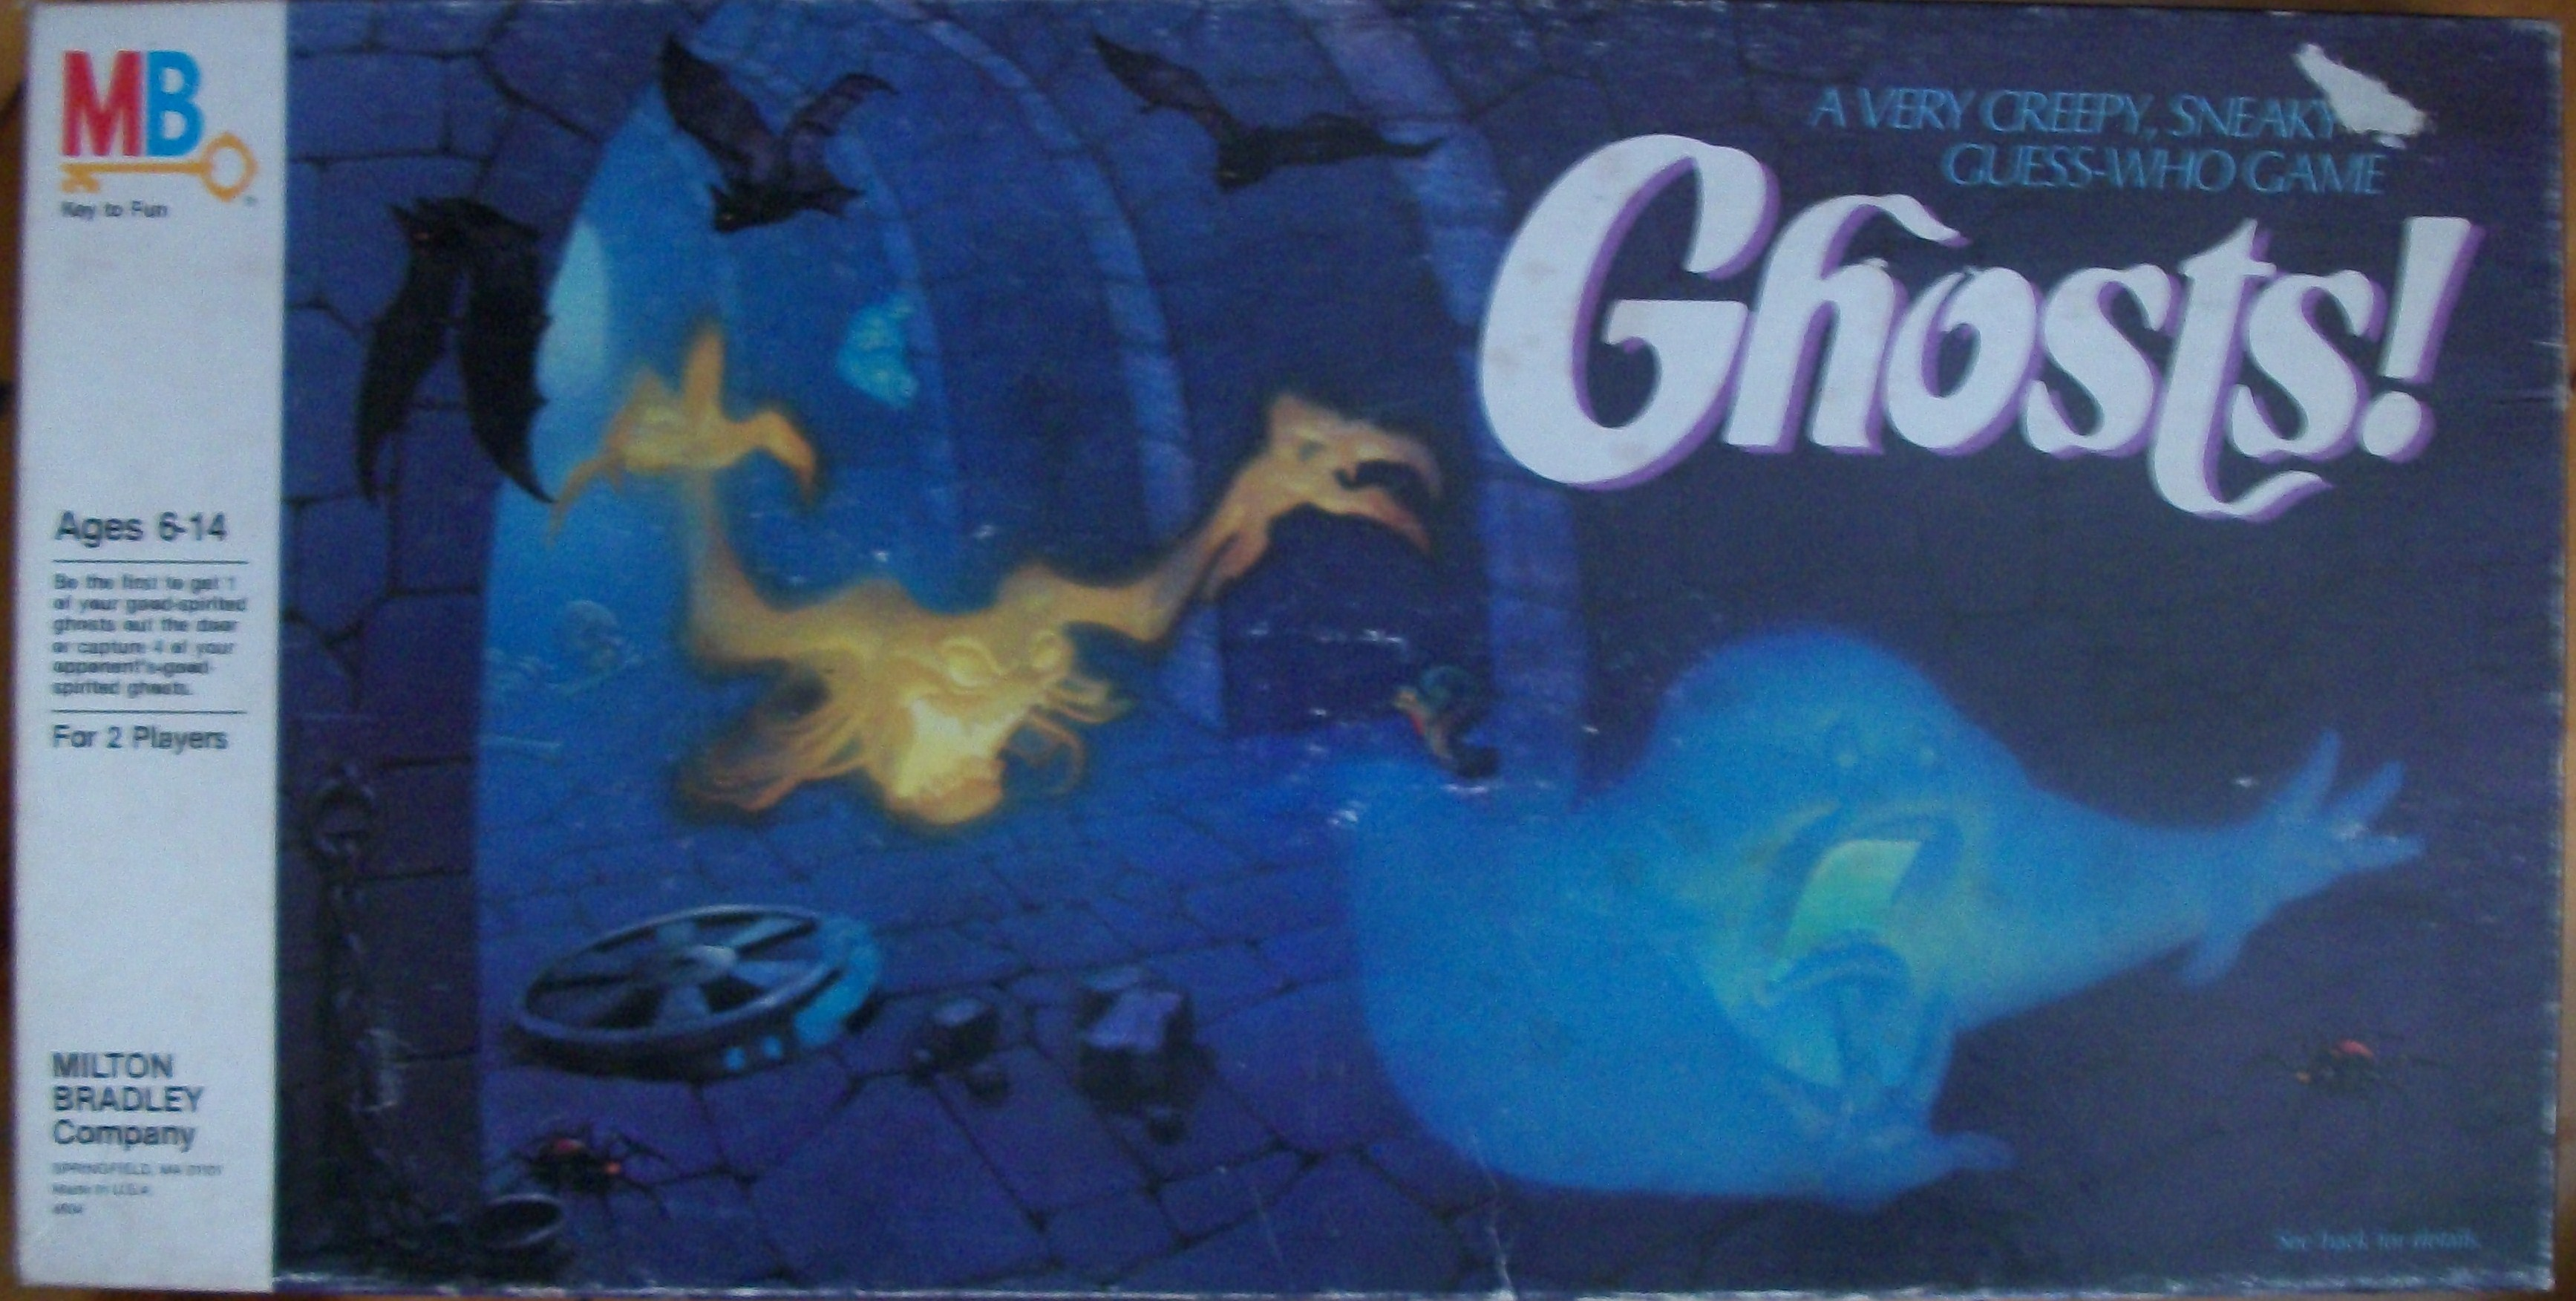 old milton bradley board game 1985 ghosts